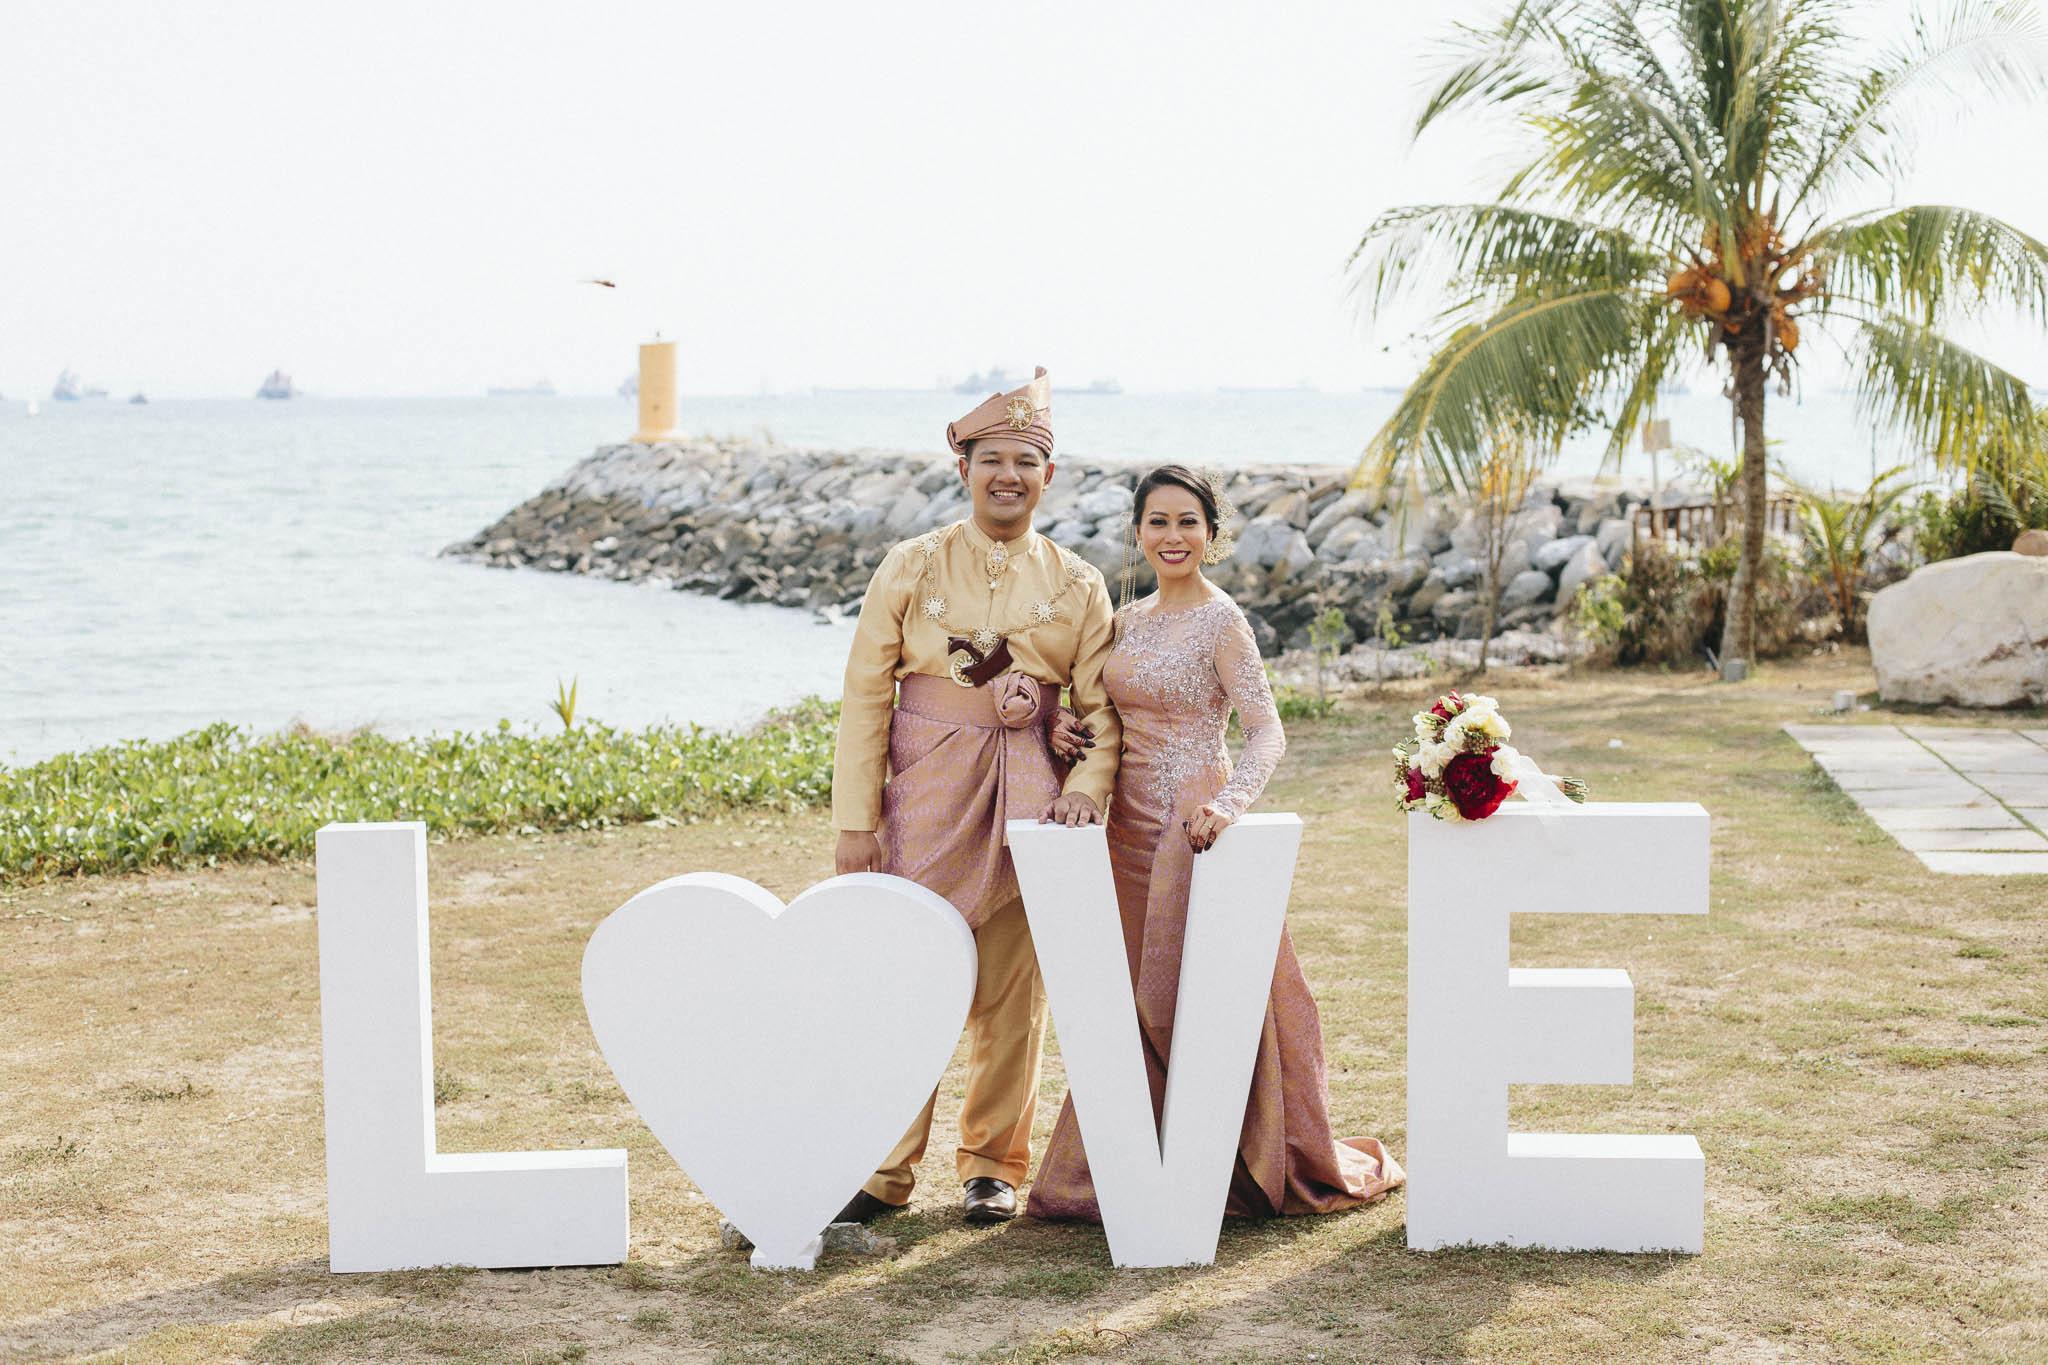 singapore-wedding-photographer-malay-indian-pre-wedding-travel-wmt-2015-72.jpg